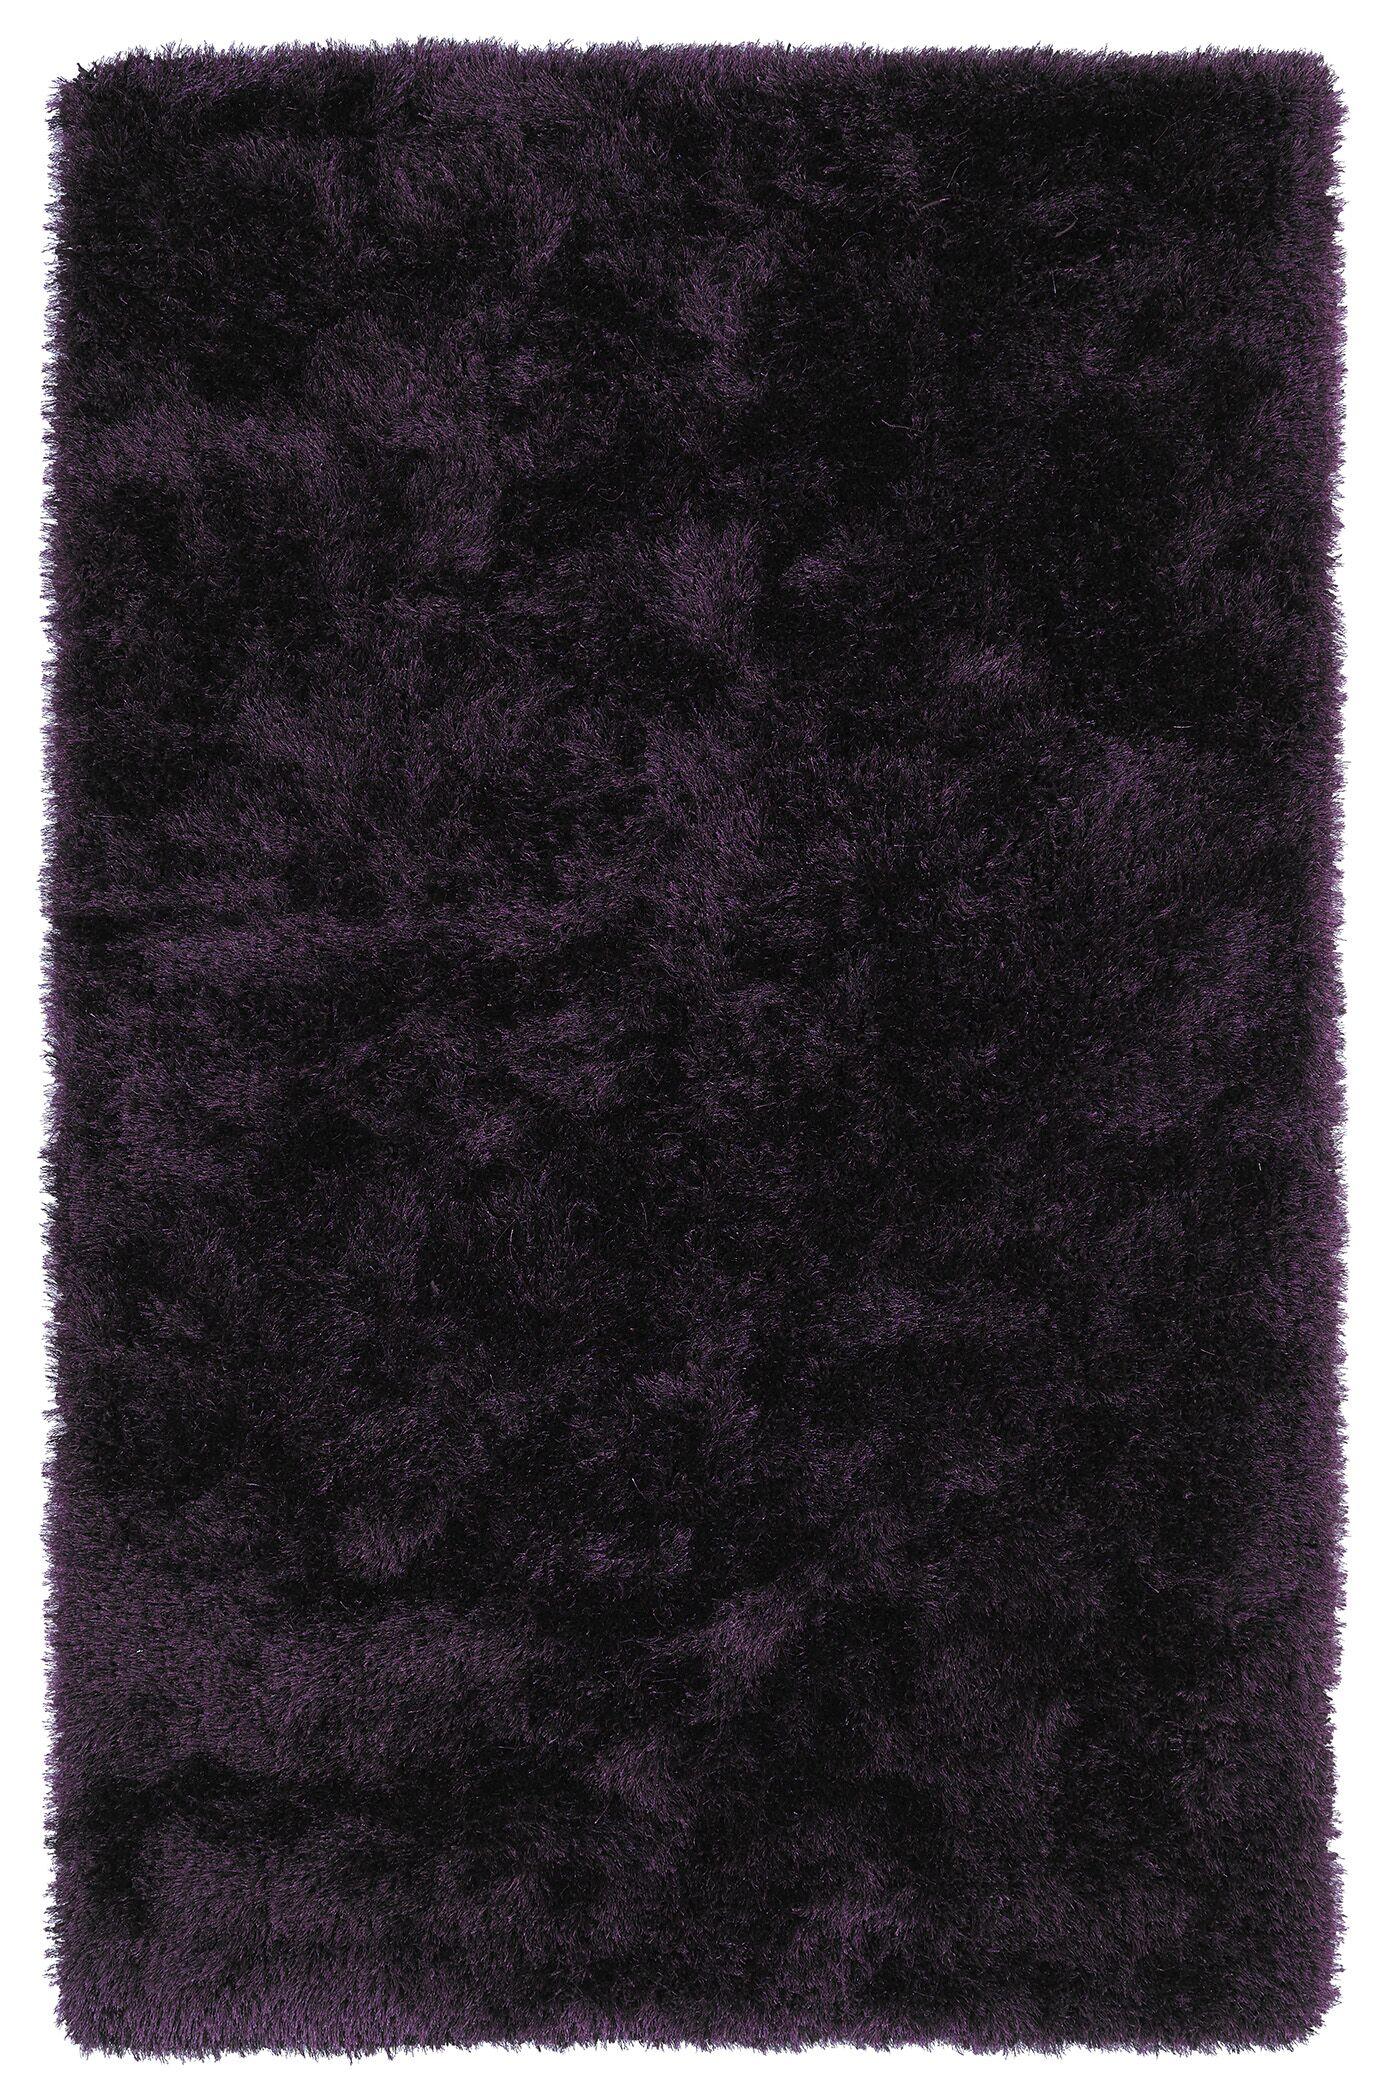 Selman Area Rug Rug Size: Rectangle 5' x 7'